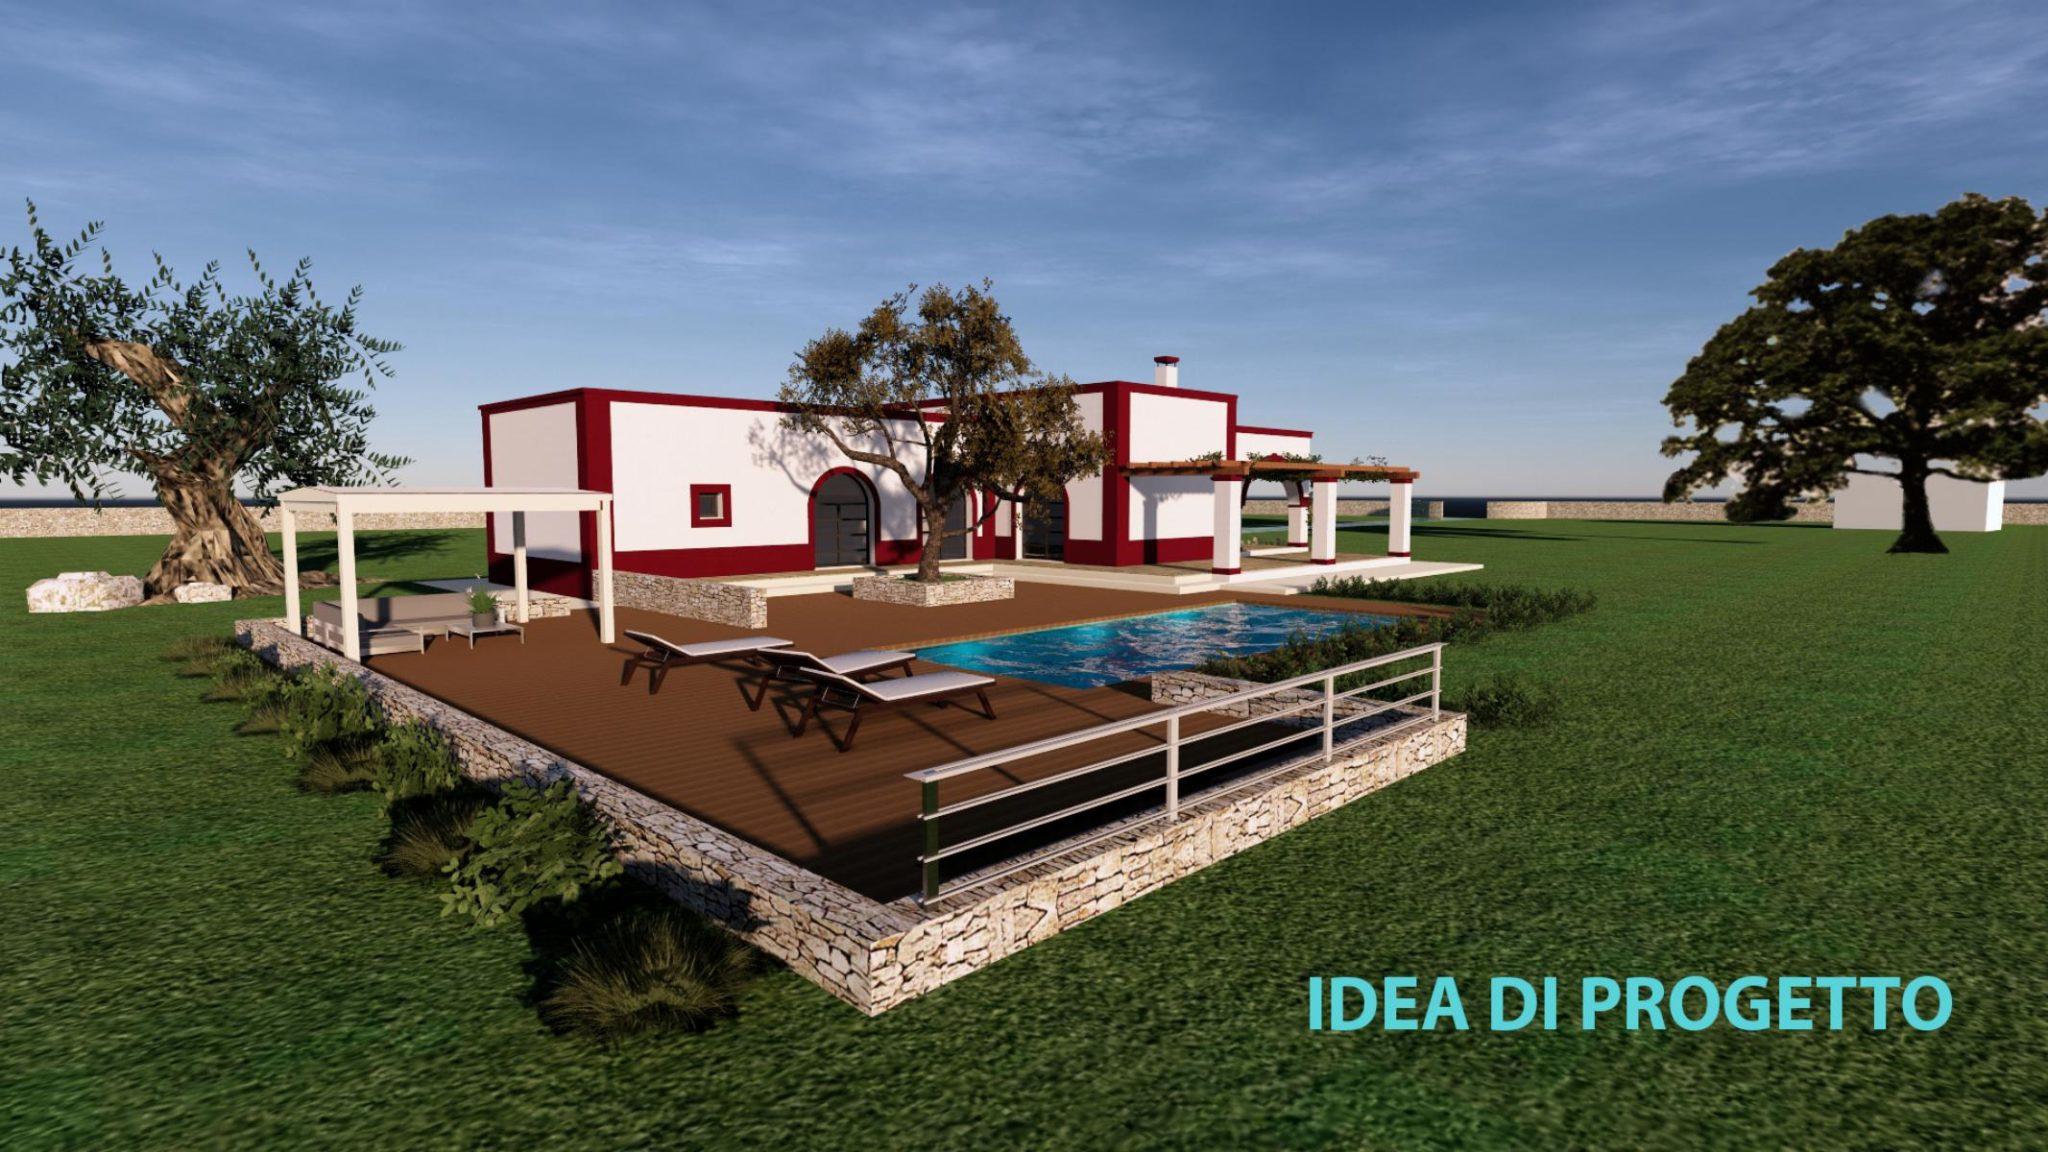 Vendita terreno – trulli e lamie rustici – Contrada Rascina, Ostuni (Brindisi)